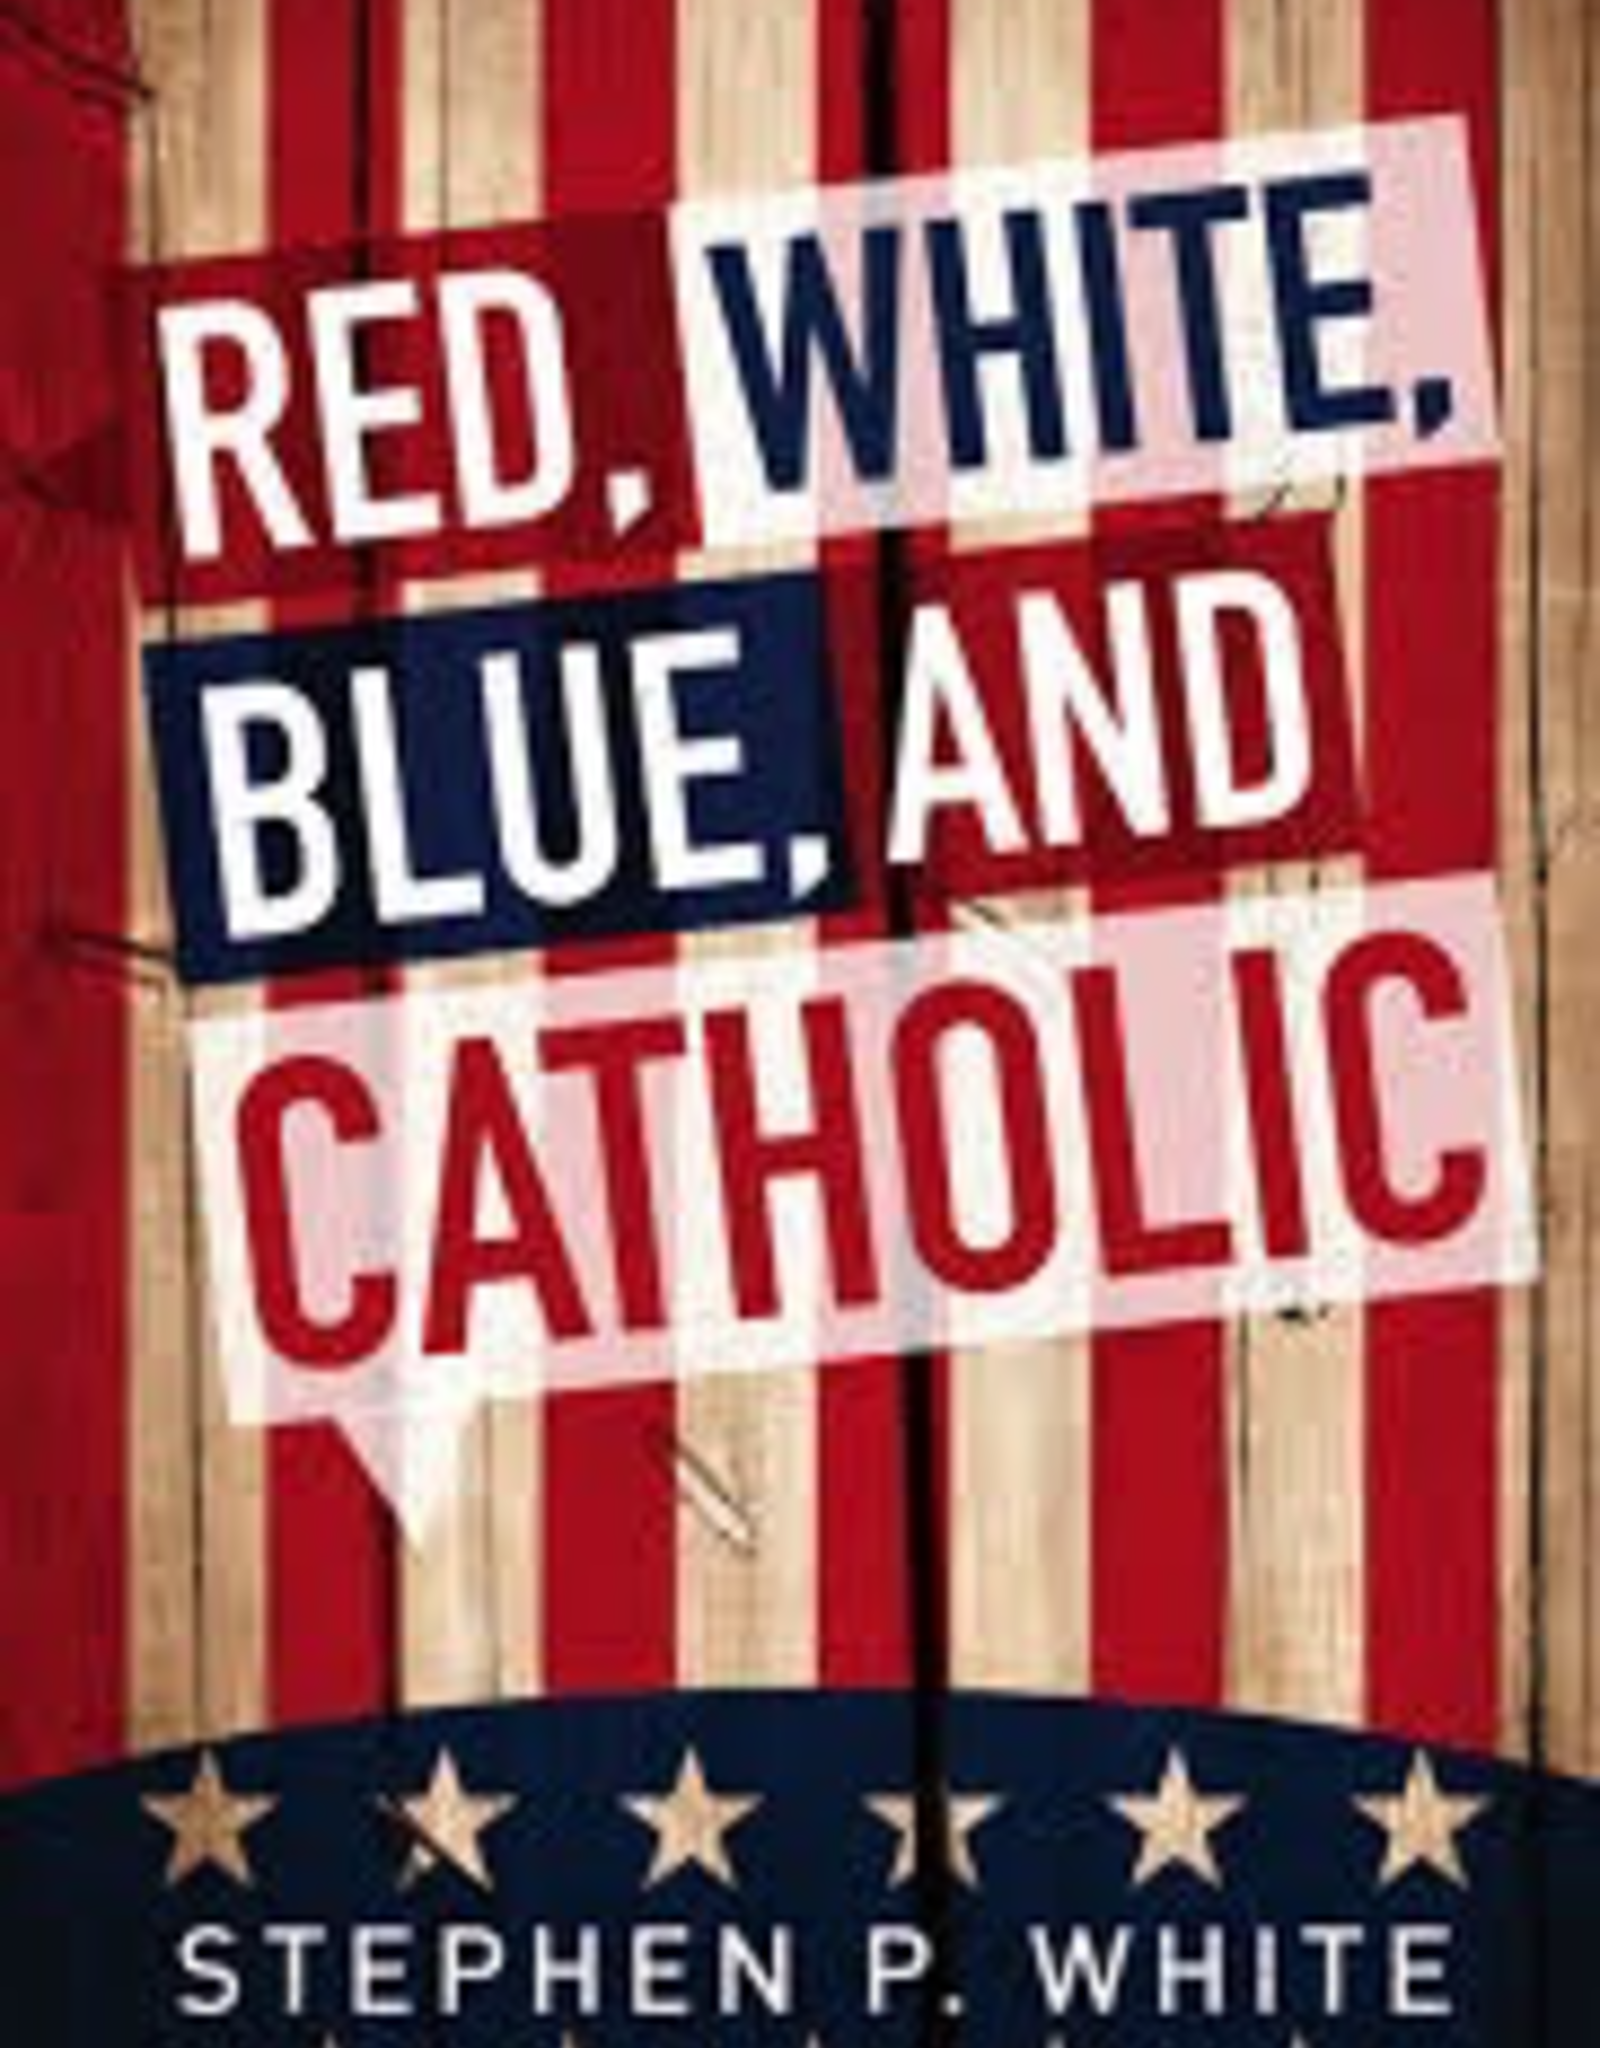 Liguori Red, White, Blue and Catholic, by Stephen P. White (paperback)